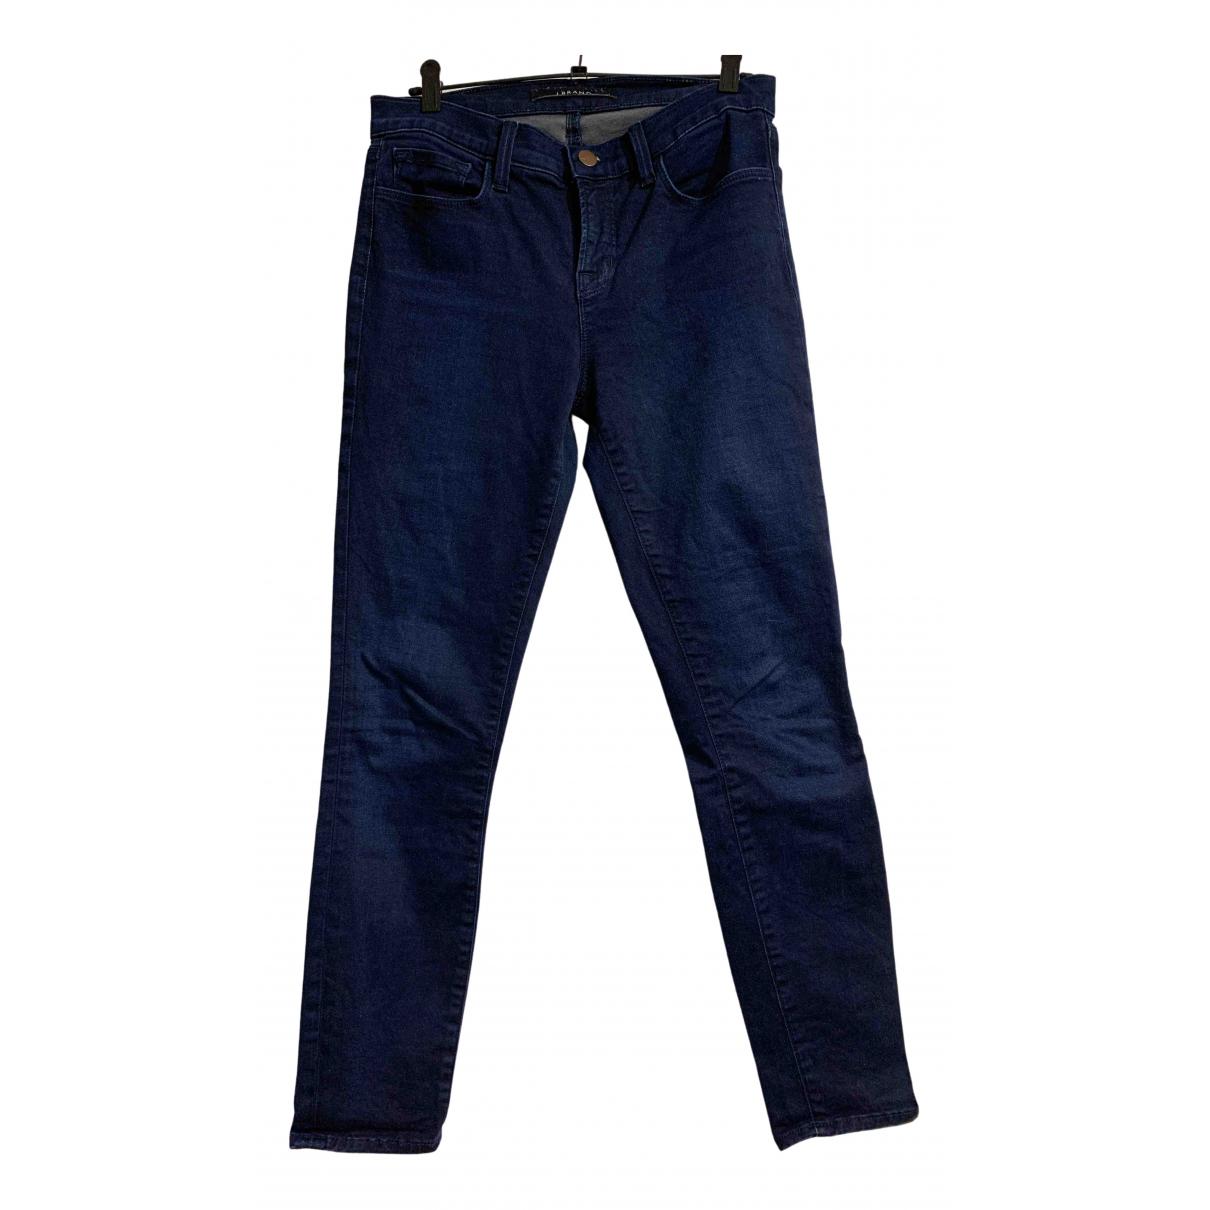 J Brand \N Blue Cotton Trousers for Women XS International